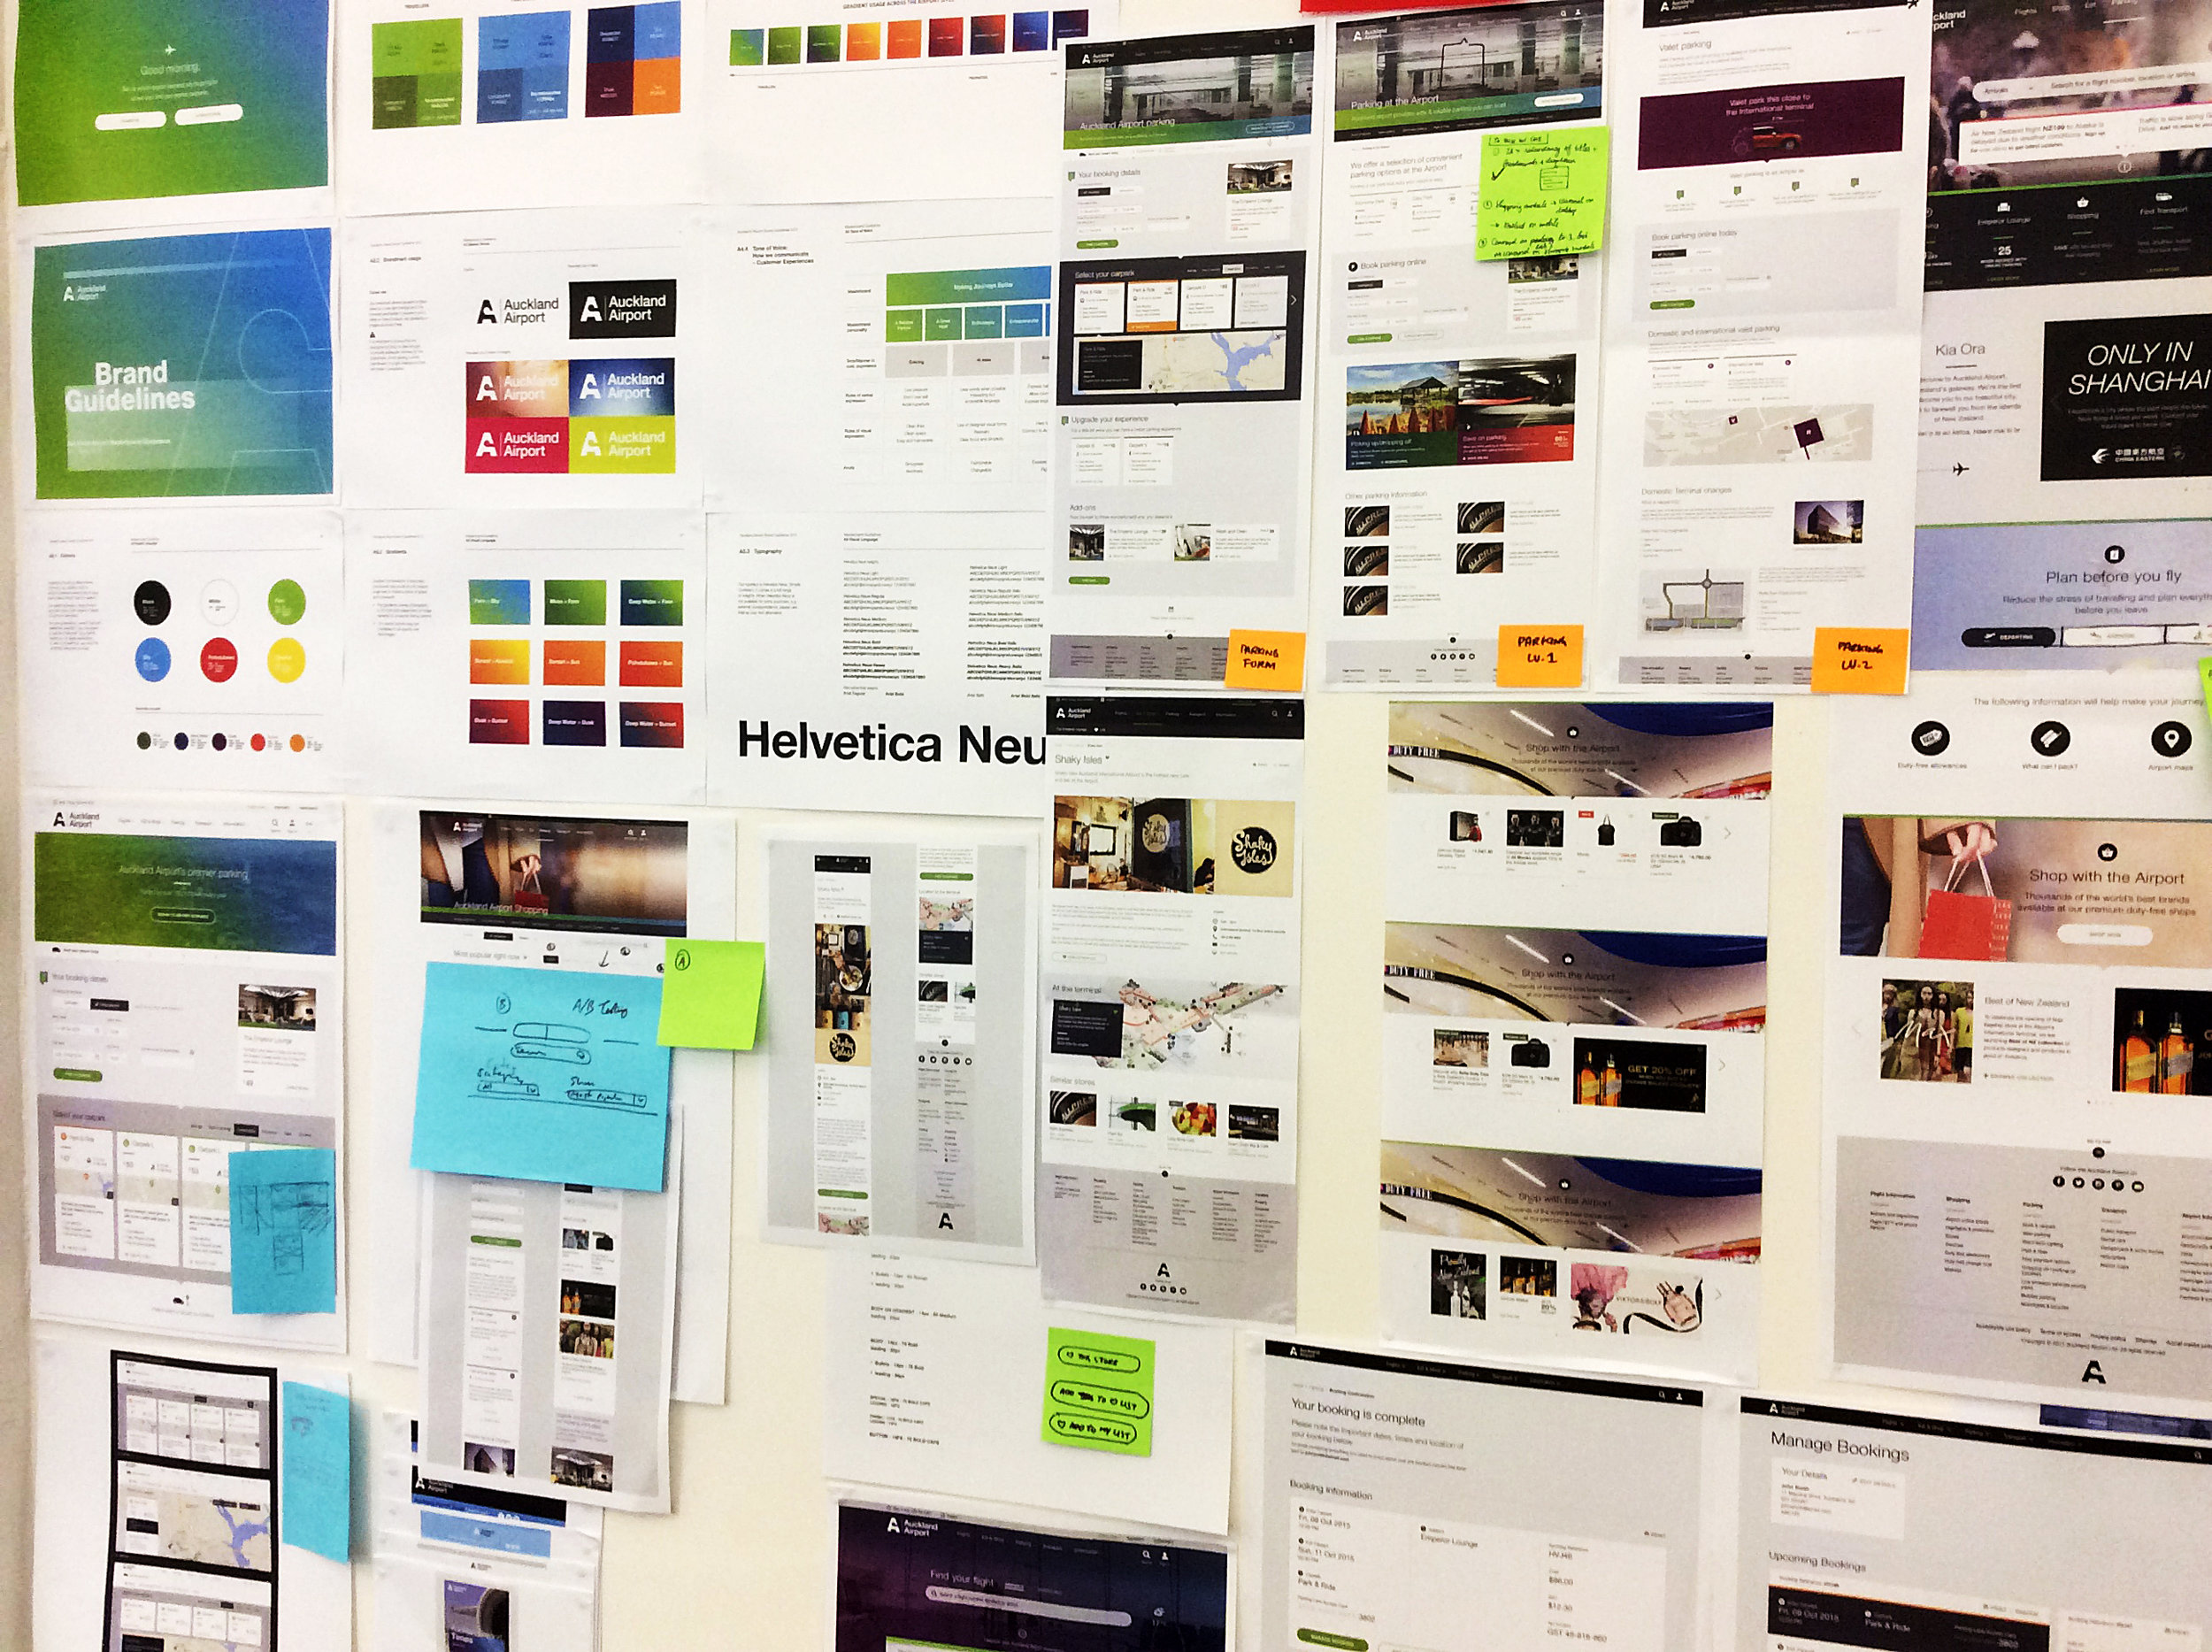 design-wall-dan03.jpg